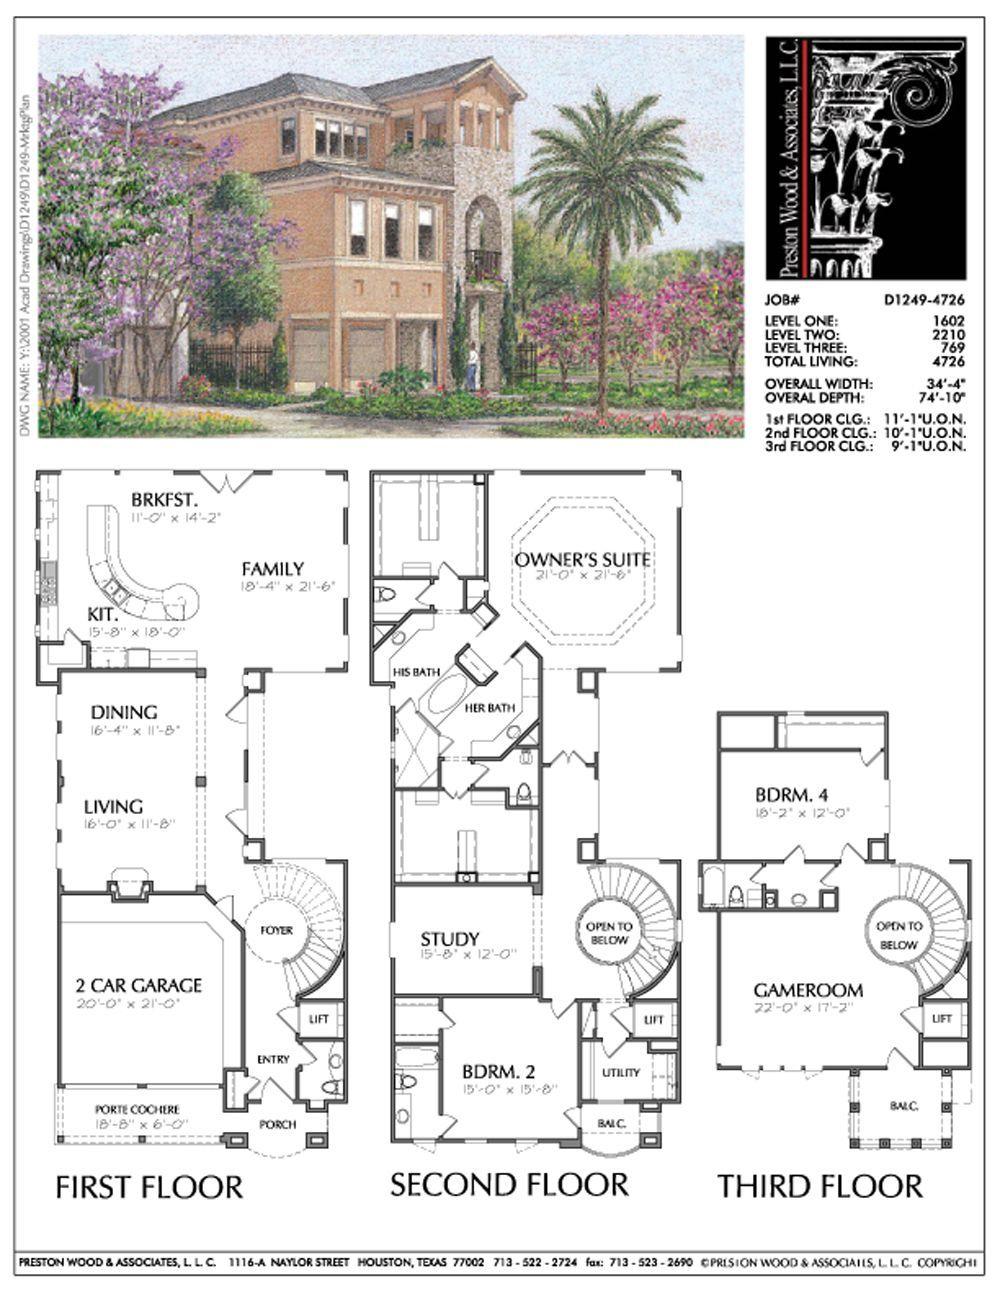 Urban Home Plan D1249 D3008 Organizedplan Family House Plans Floor Plan Design Home Design Plans